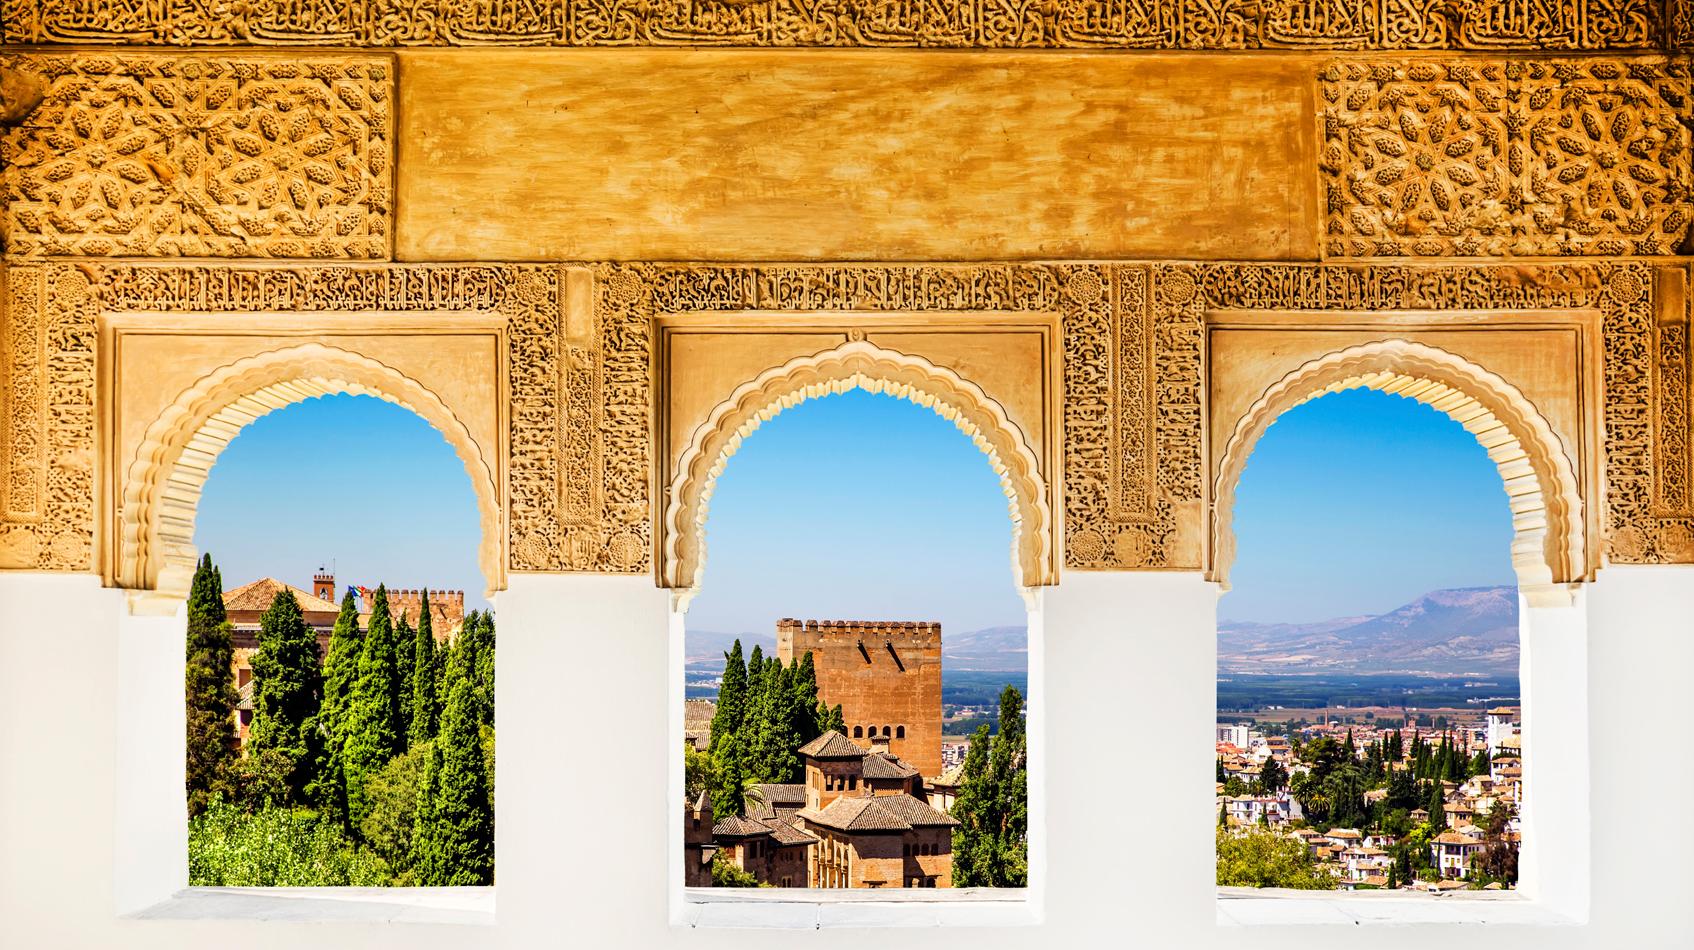 Alhambra_Windows-Alhambra_Credit-MarquesPhotography_iStock_http___www.istockphoto